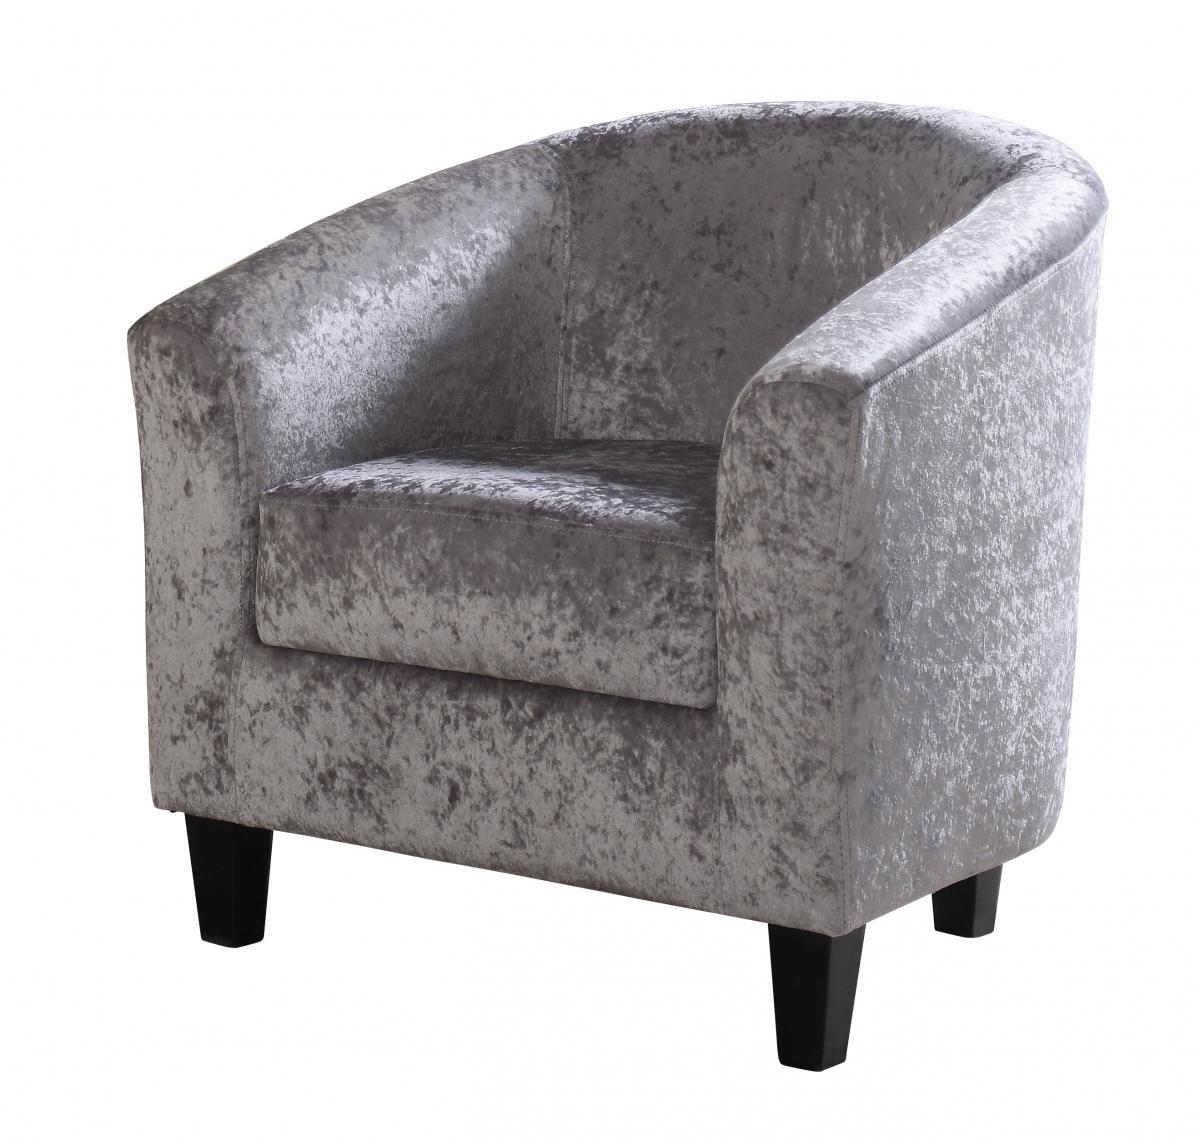 Great Discount on Claridon 1 Seater Sofa Crushed Velvet Silver | Oak Furniture Online